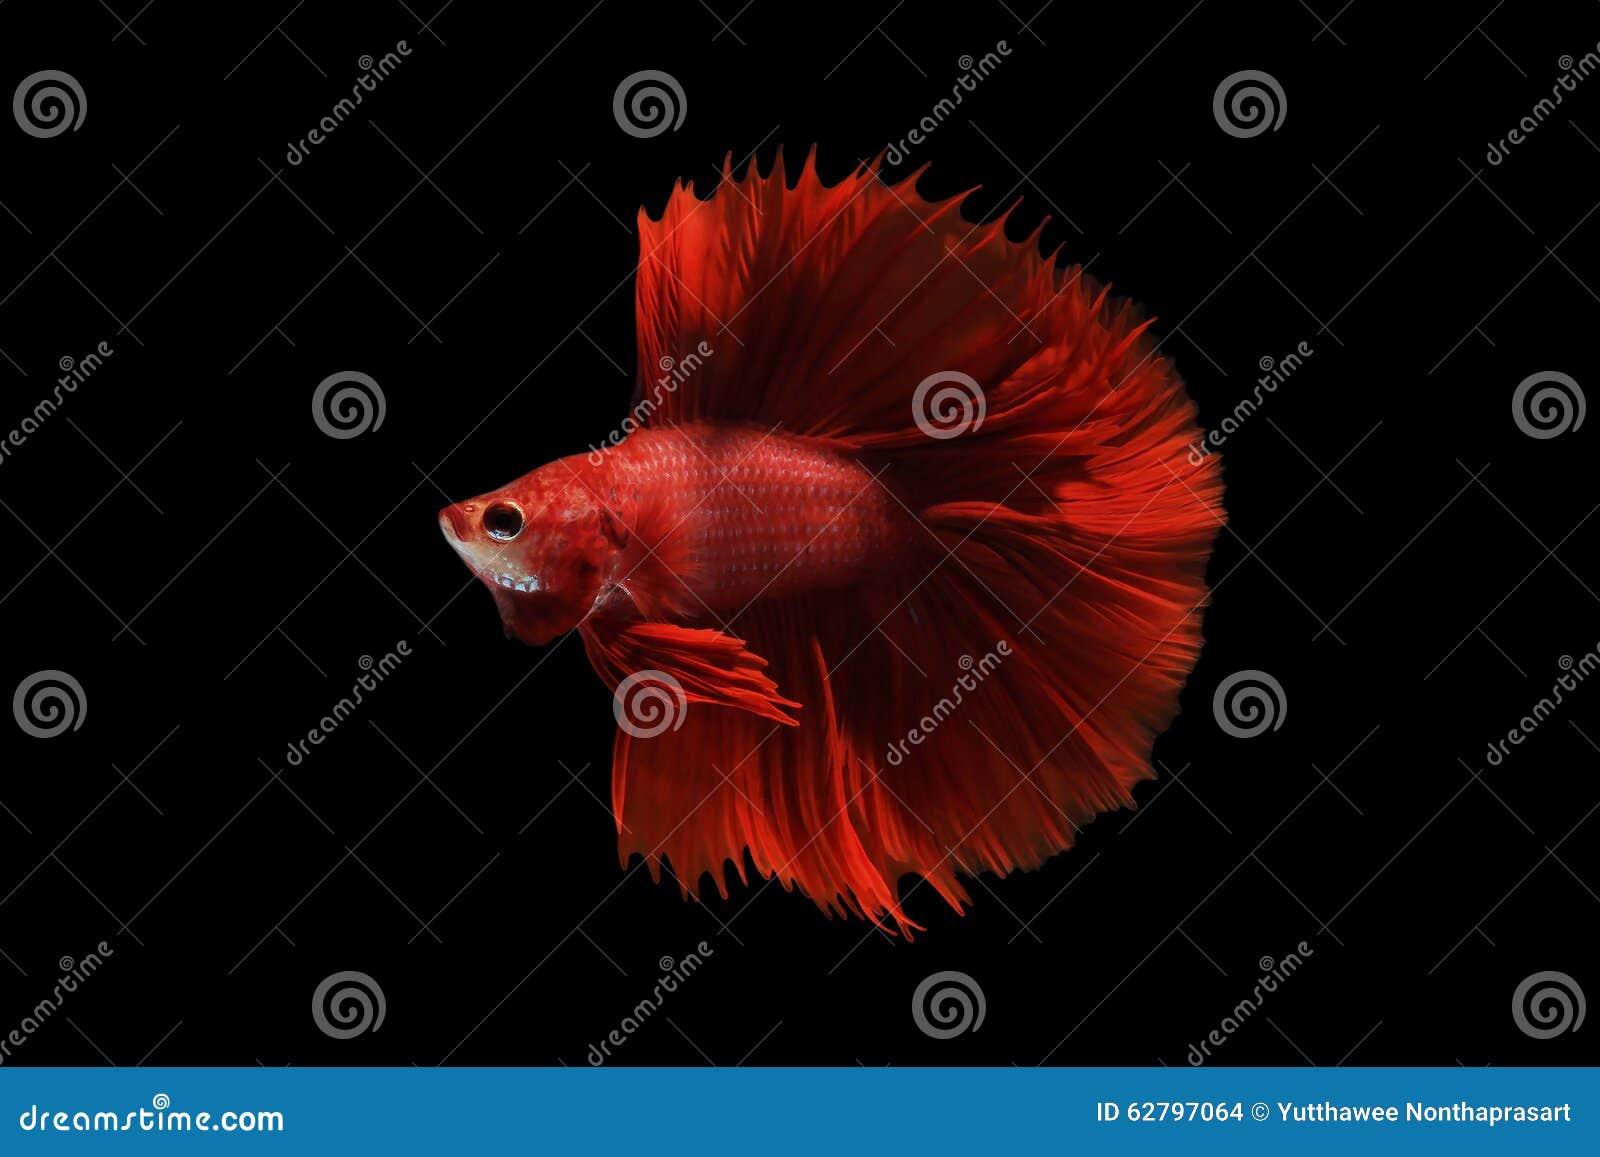 Red betta fish stock photo. Image of colorful, betta - 62797064